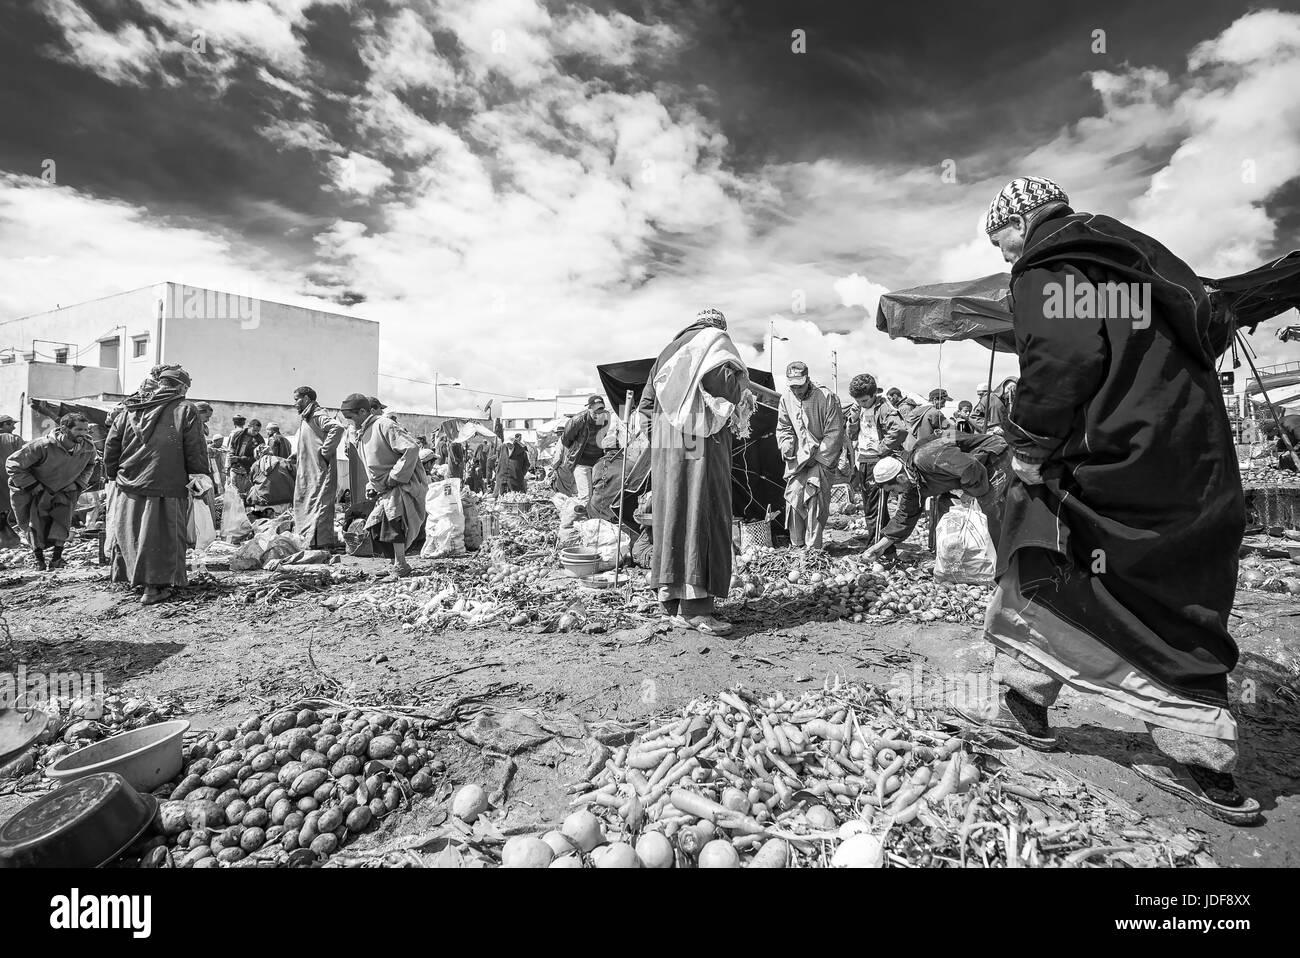 Traditional farmer market in Morocco - Stock Image